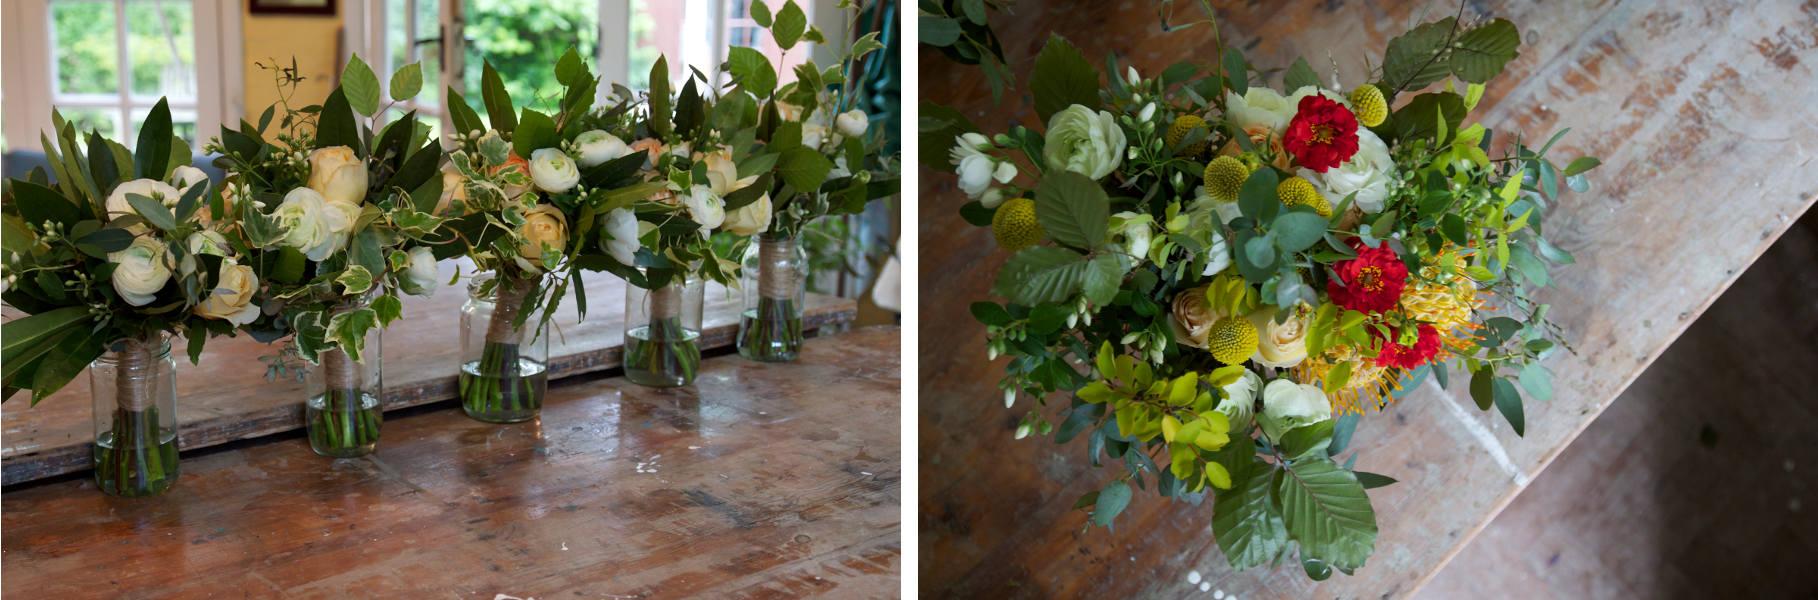 Wedding Flowers In East Sussex : Rachel grimes flowers wedding and bouquets in